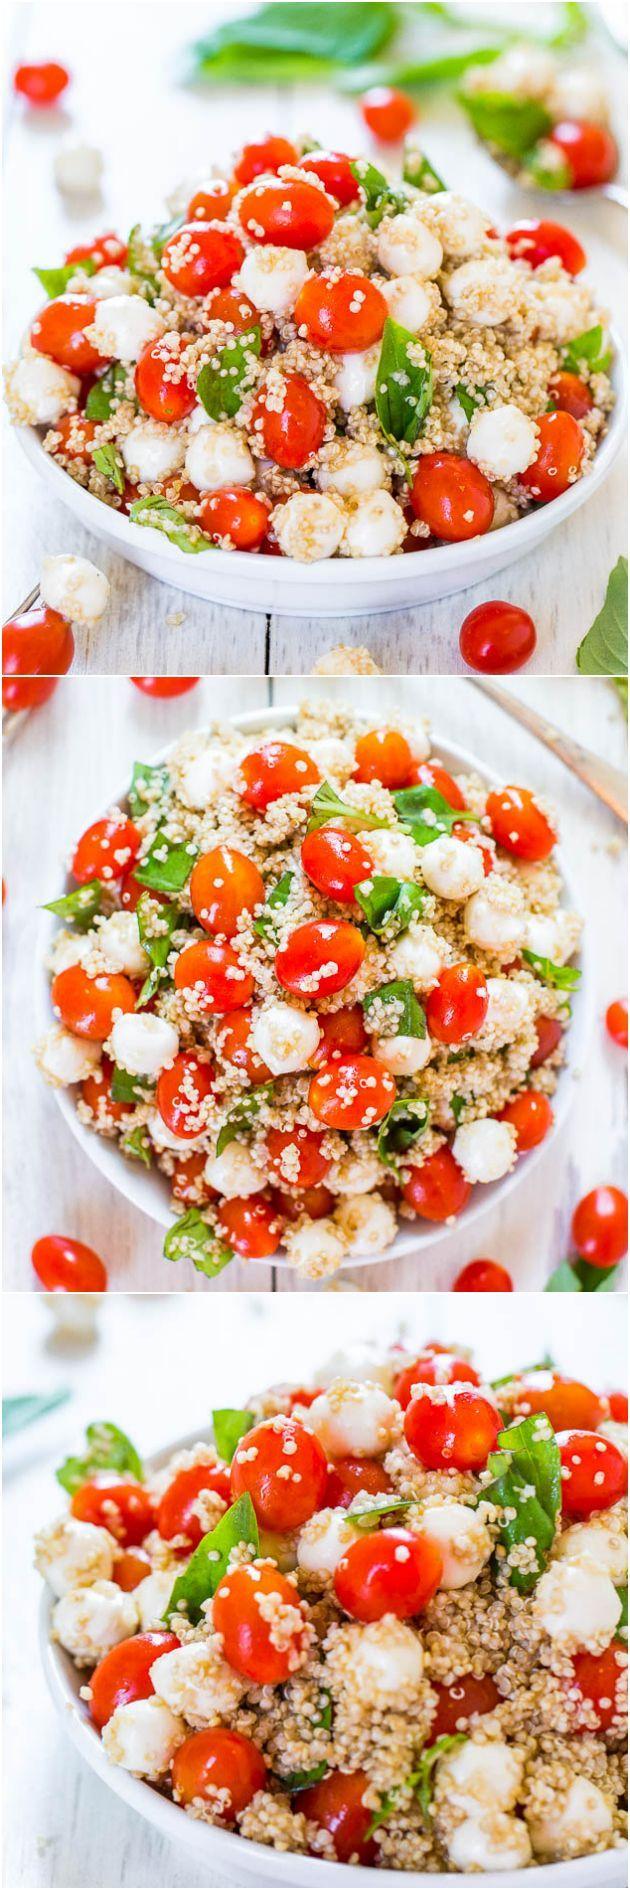 Tomato, Mozzarella  Basil Quinoa Salad (GF) - Trying to keep meals healthier  lighter? Make this easy, refreshing  satisfying salad!